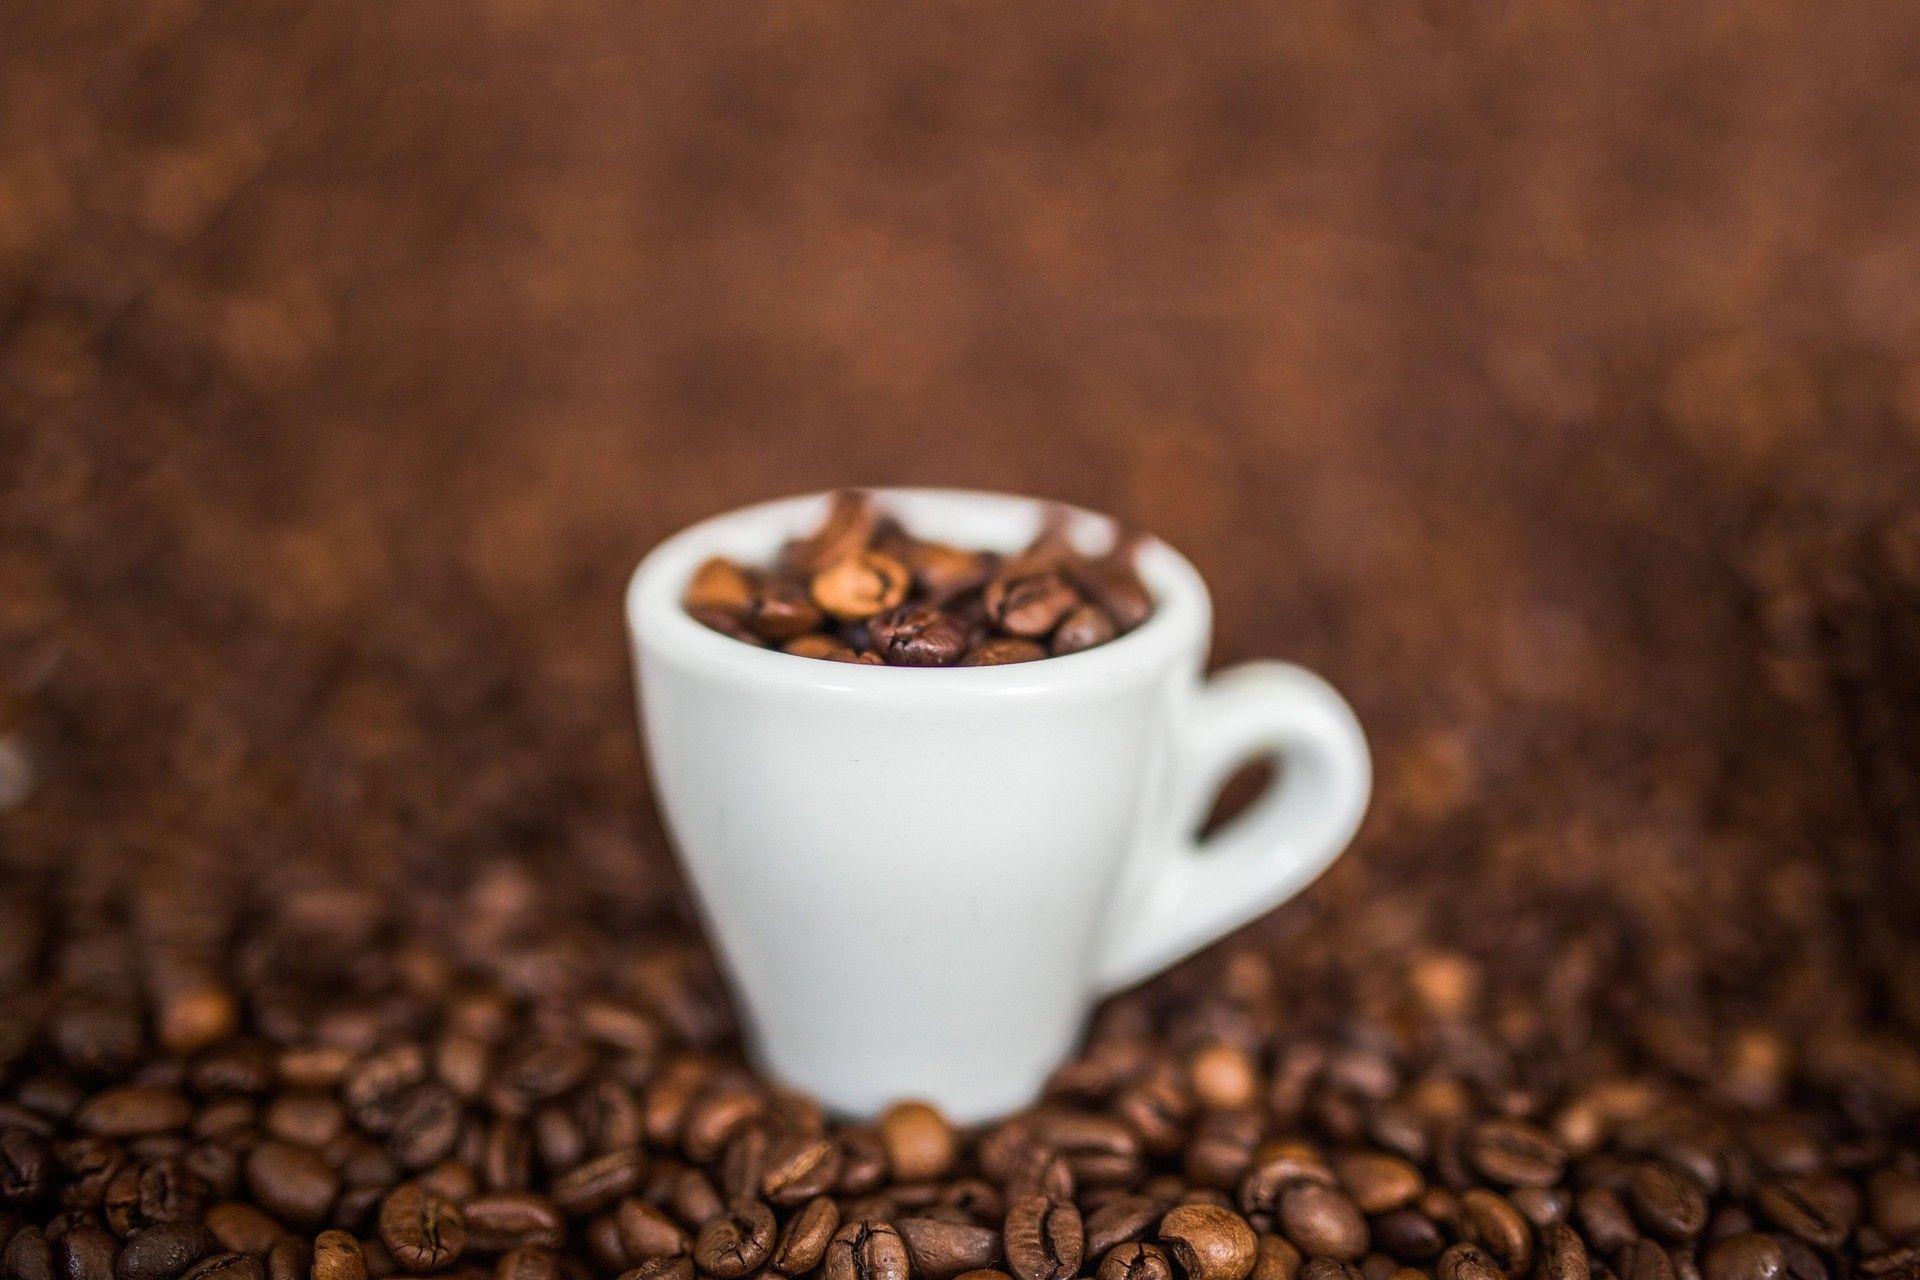 coffee-beans-926074_1920